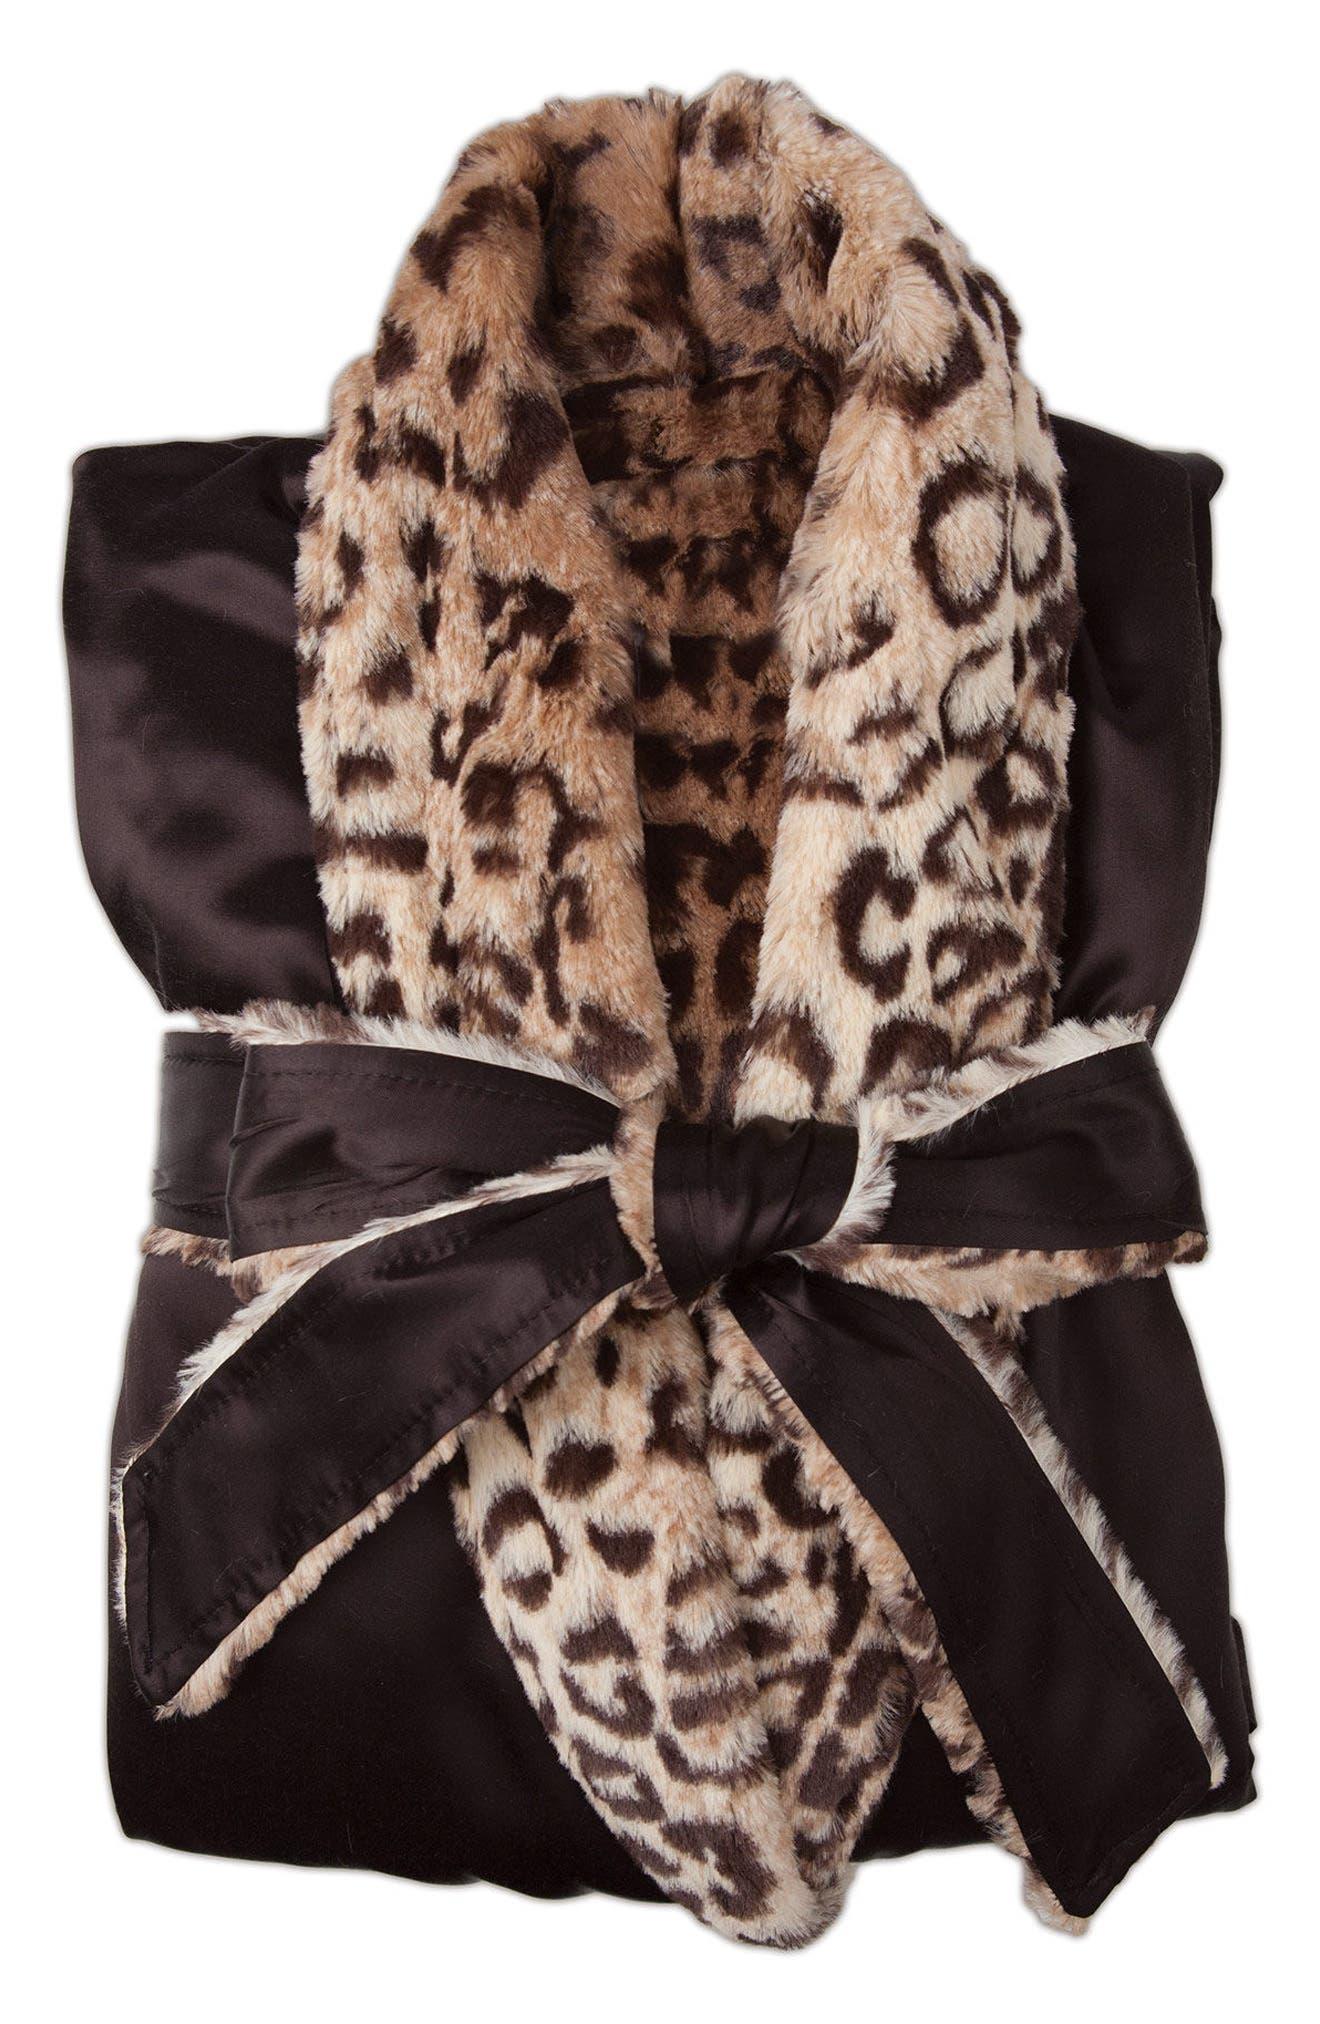 Main Image - Giraffe at Home Faux Fur & Satin Robe